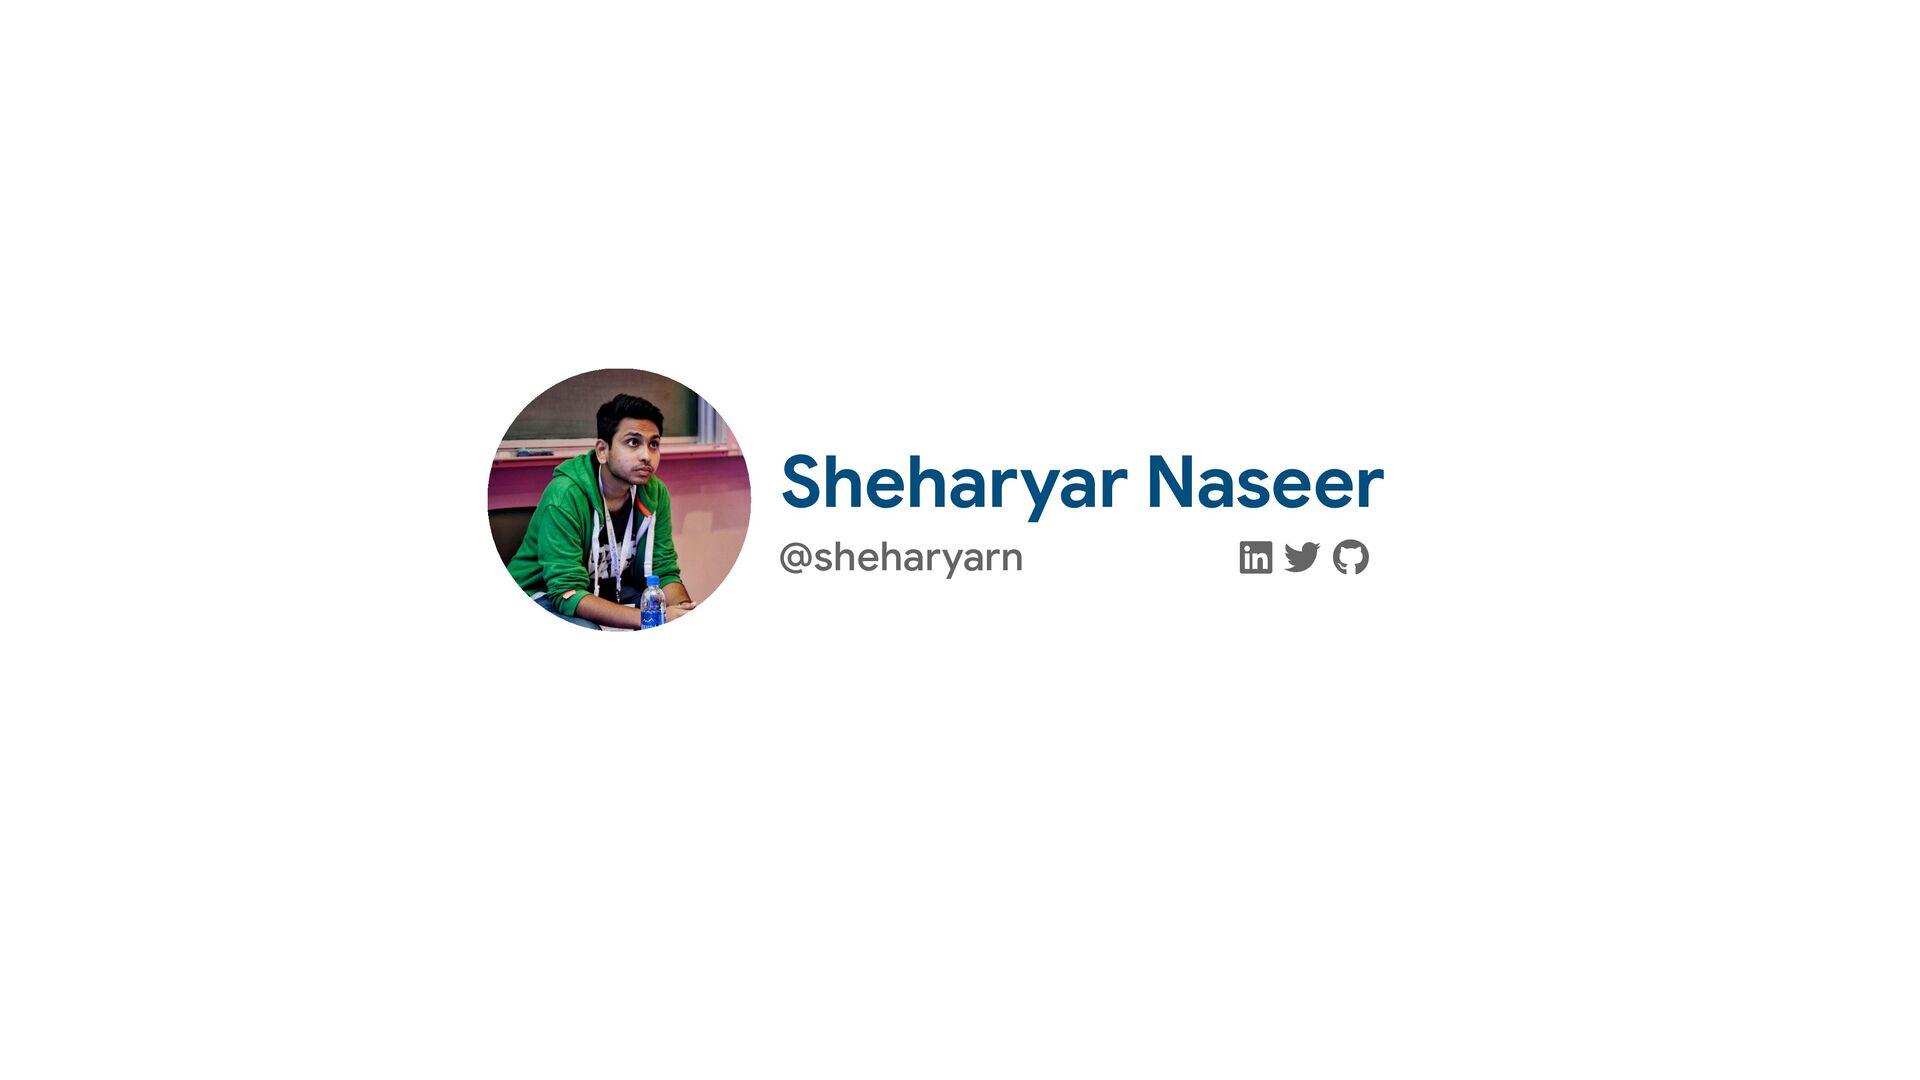 "@sheharyarn ! "" # Sheharyar Naseer"